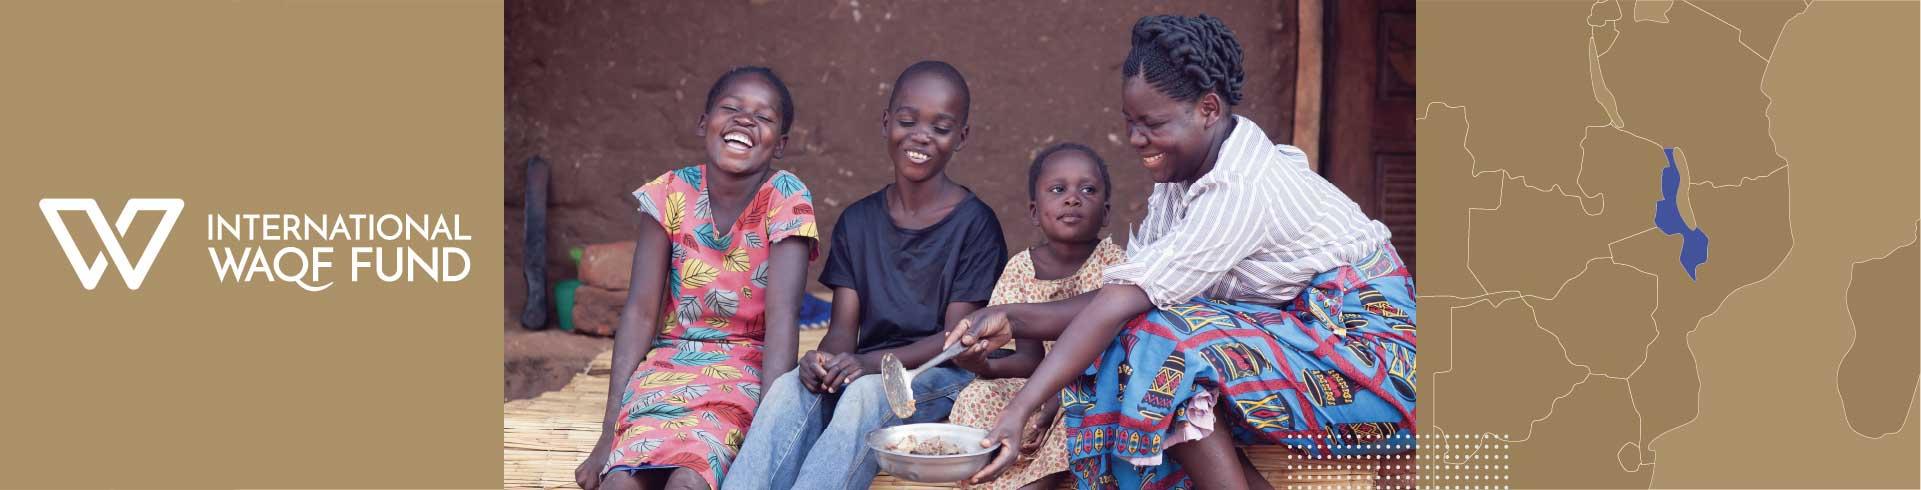 Helping families in Malawi celebrate Eid